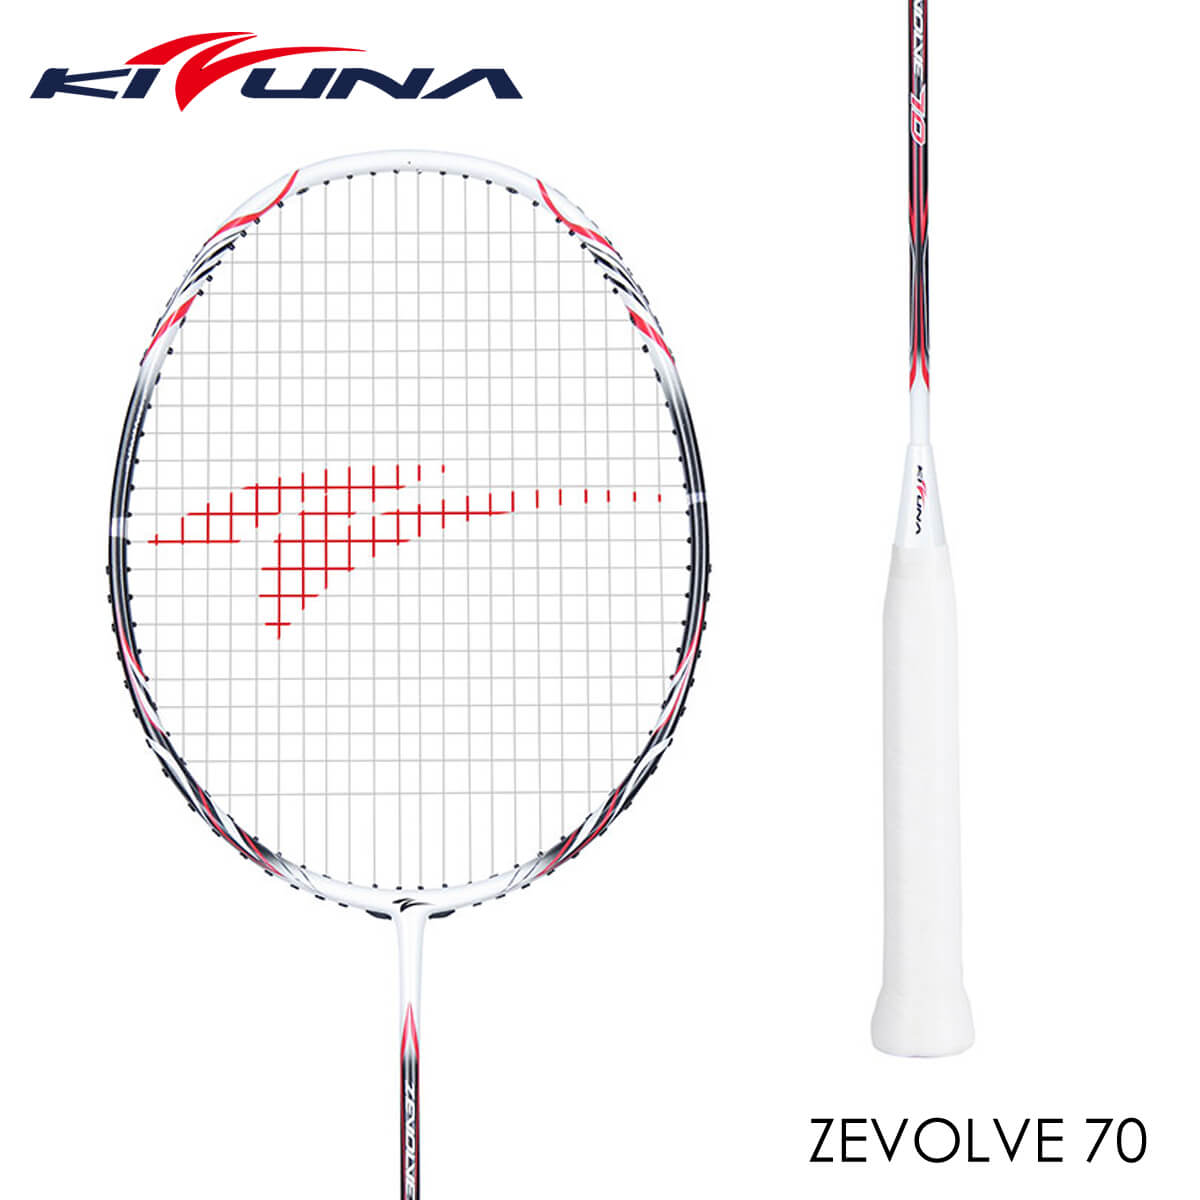 KIZUNA Z70 ZEVOLVE 70 バドミントンラケット キズナ【ガット張り工賃無料/ 取り寄せ】